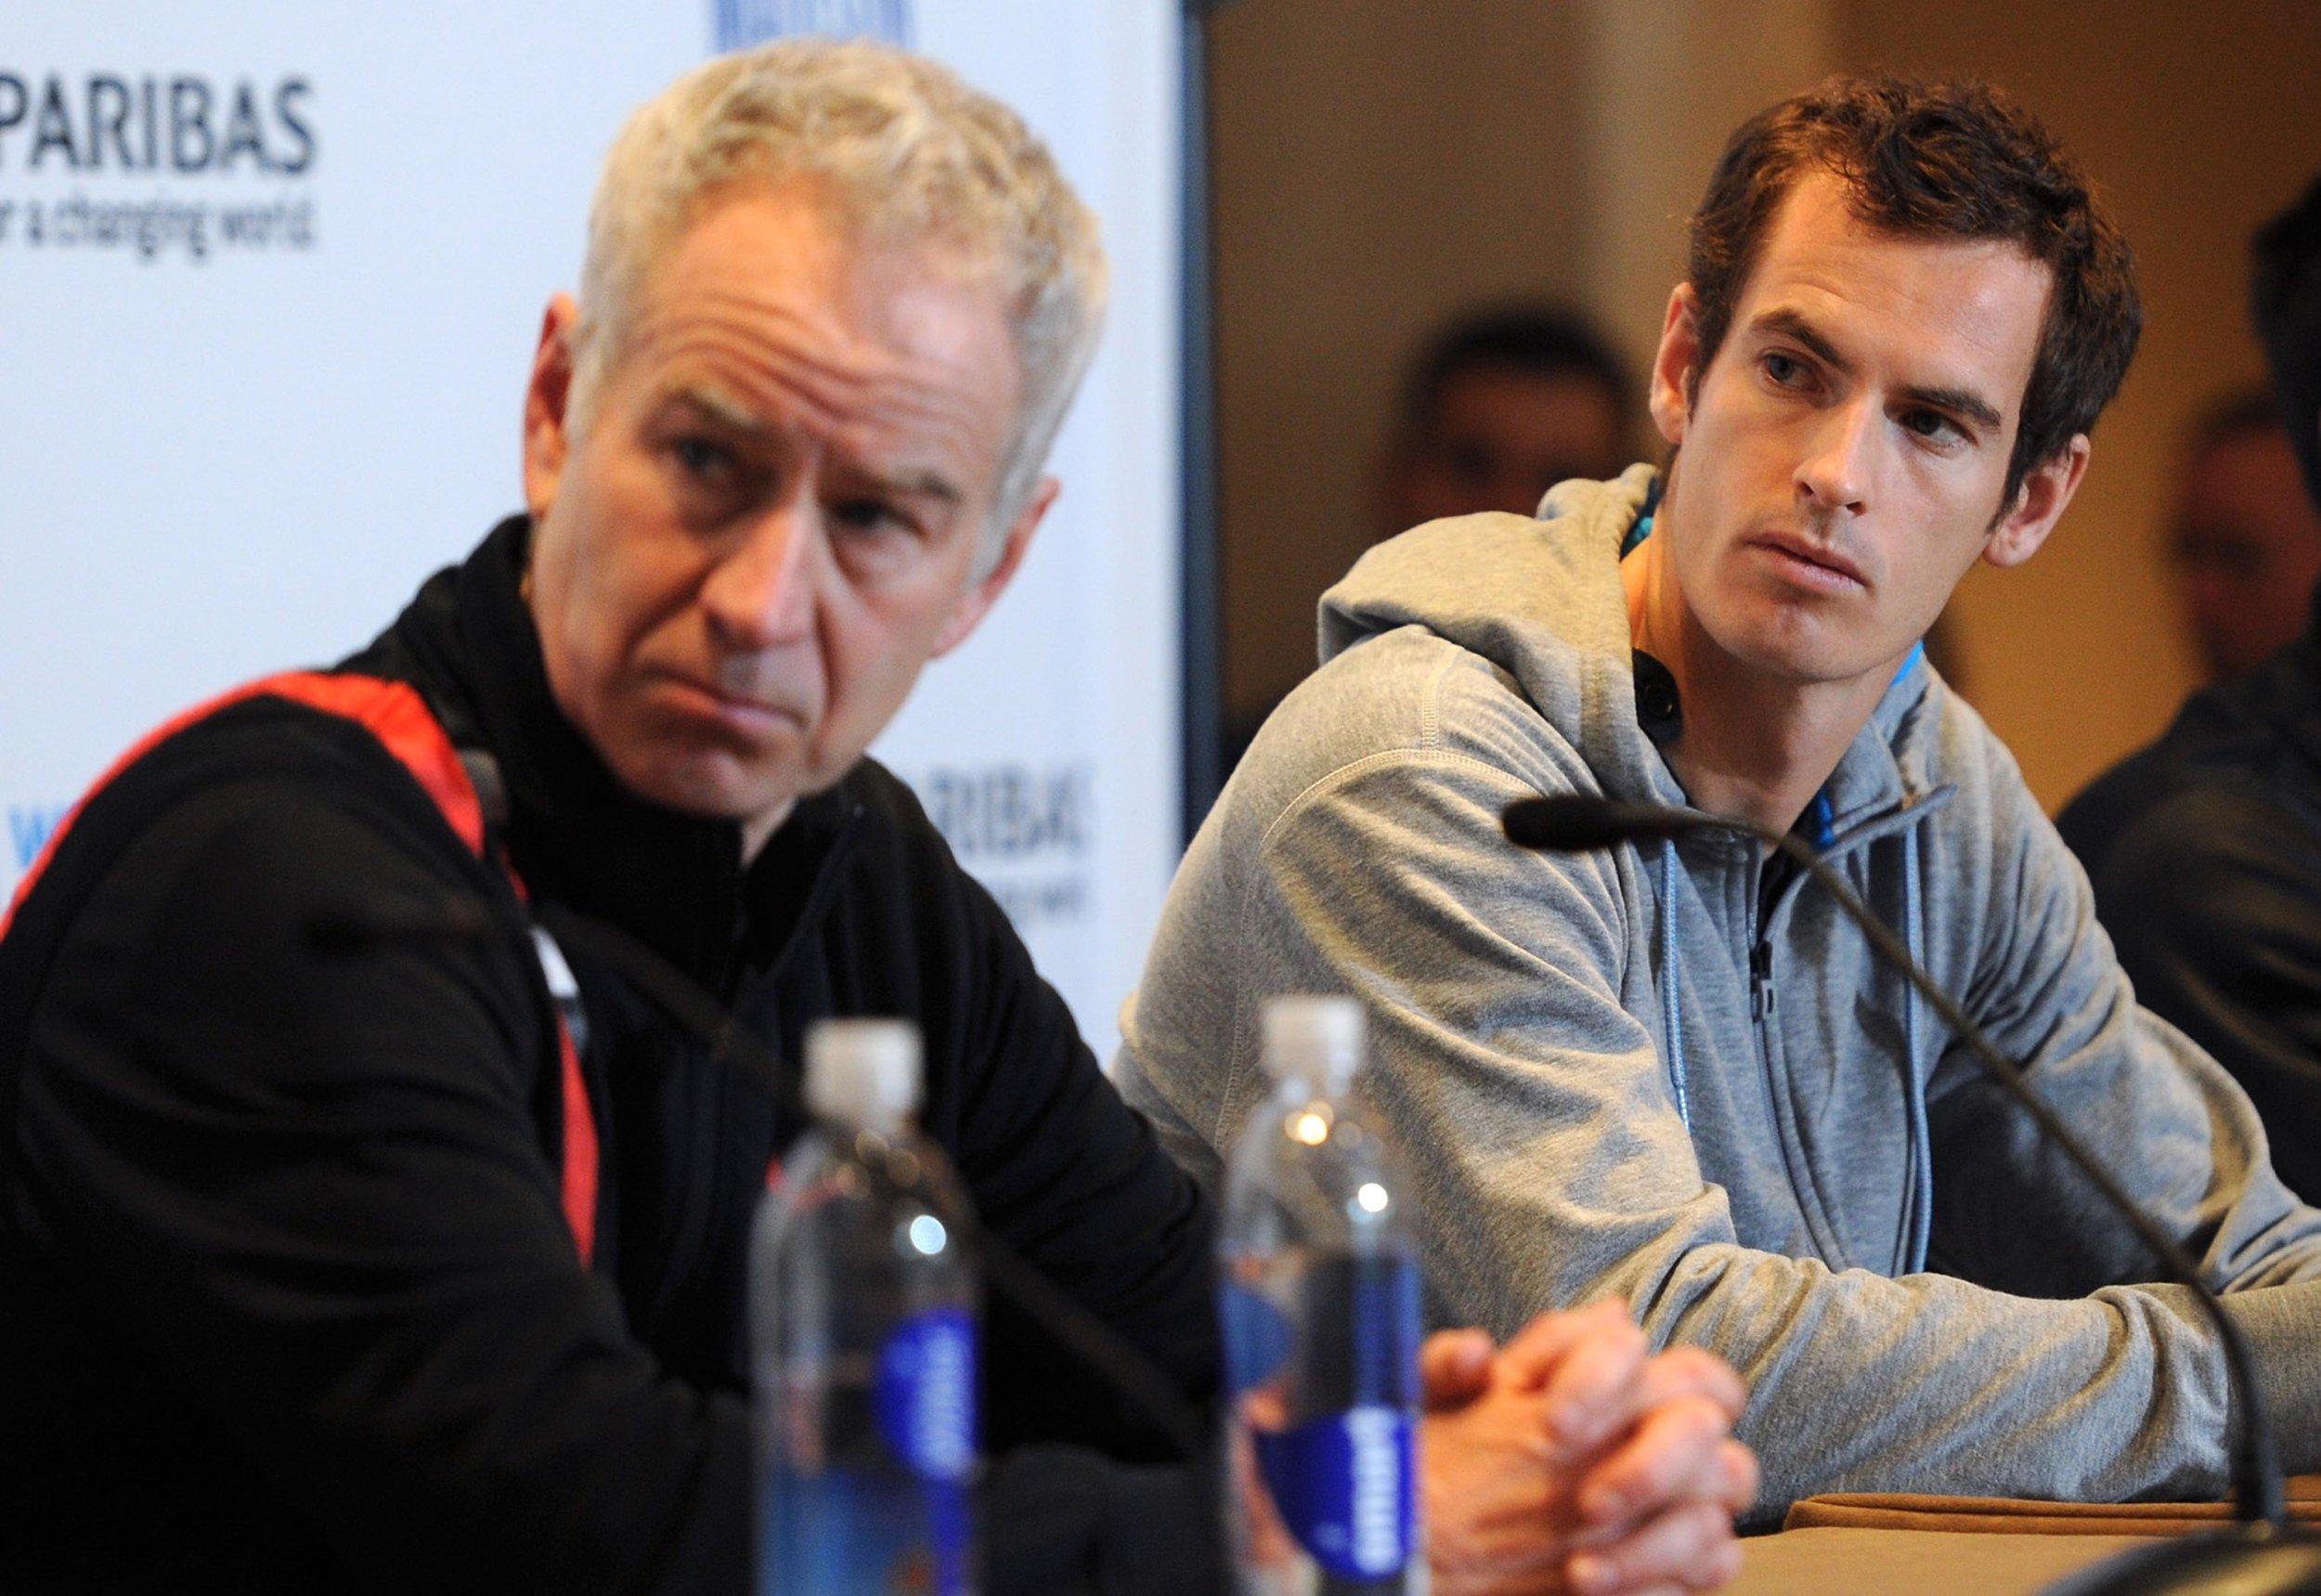 McEnroe and Murray